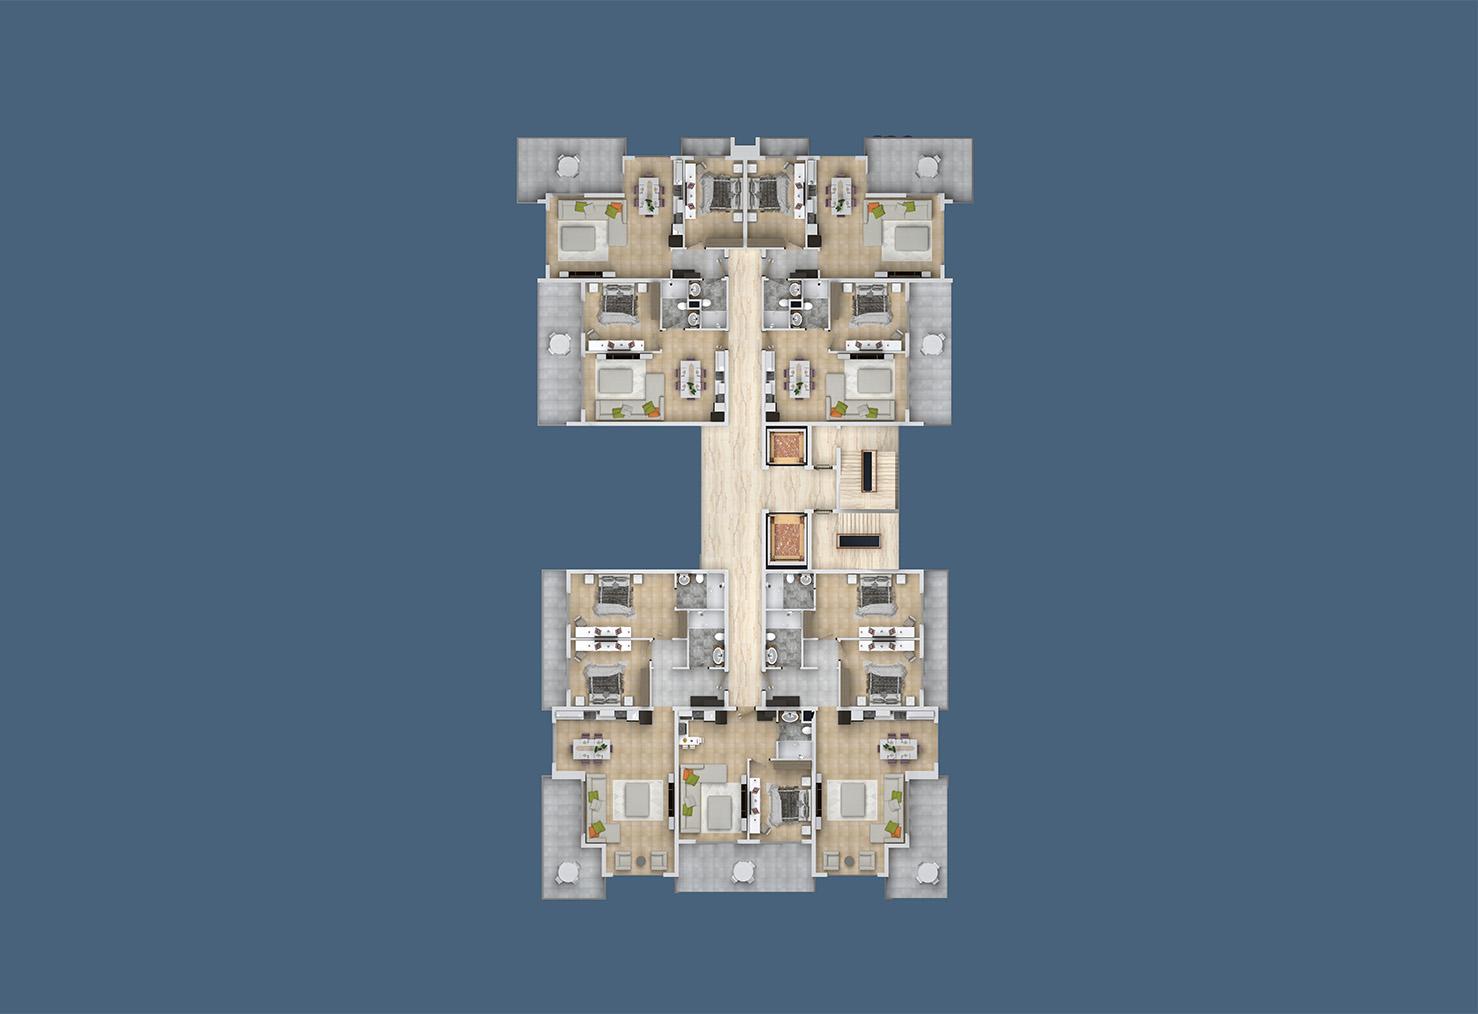 Floor plans of apartments 9 floor «C» Yekta Kingdom Trade Center